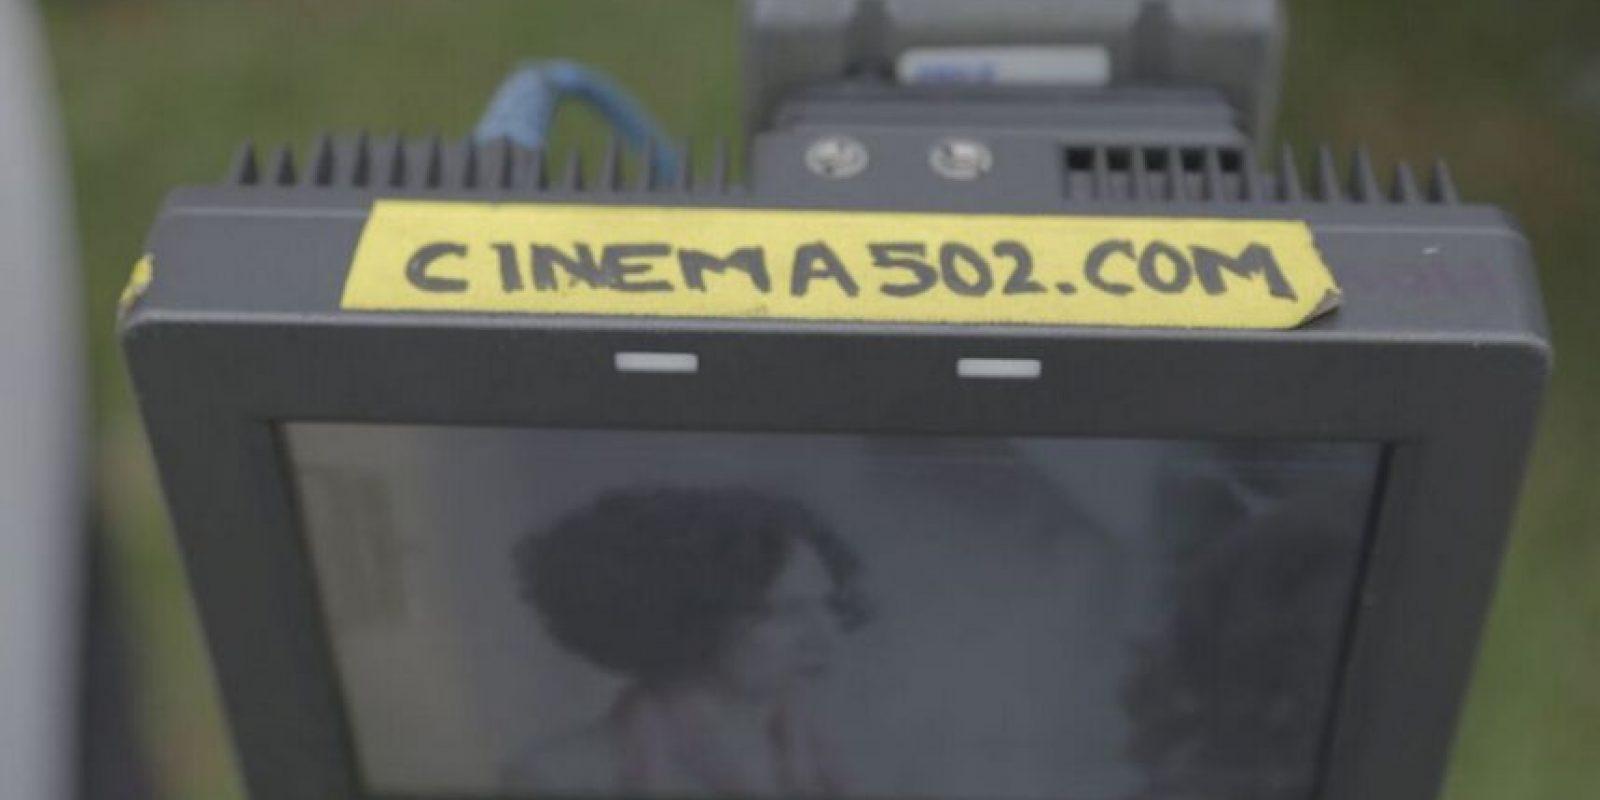 Foto:Cinema 502